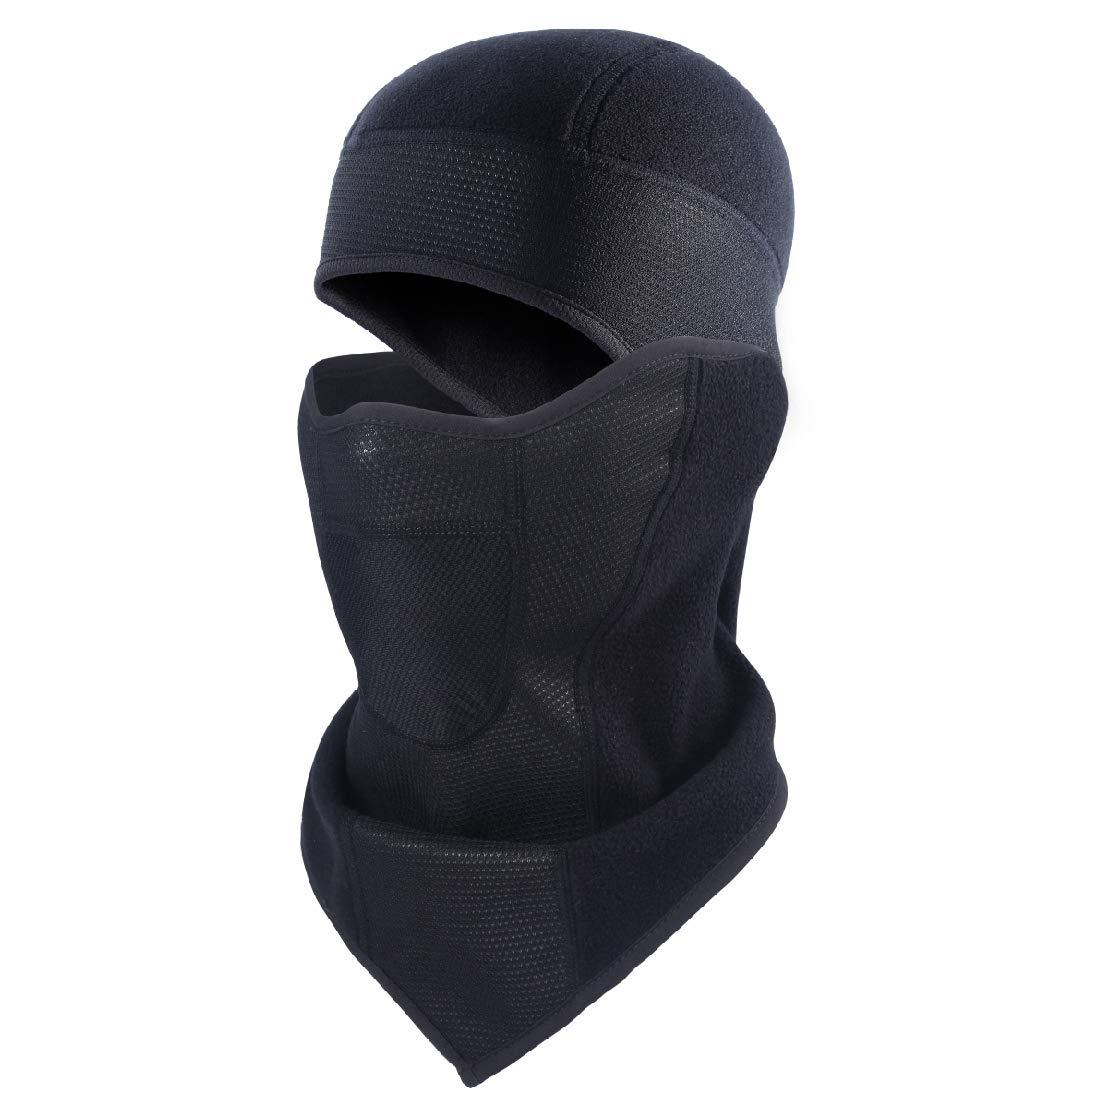 TRIWONDER Balaclava Ski Mask Fleece Face Cover Neck Warmer Winter Helmet Liner Skull Beanie Hat Headband